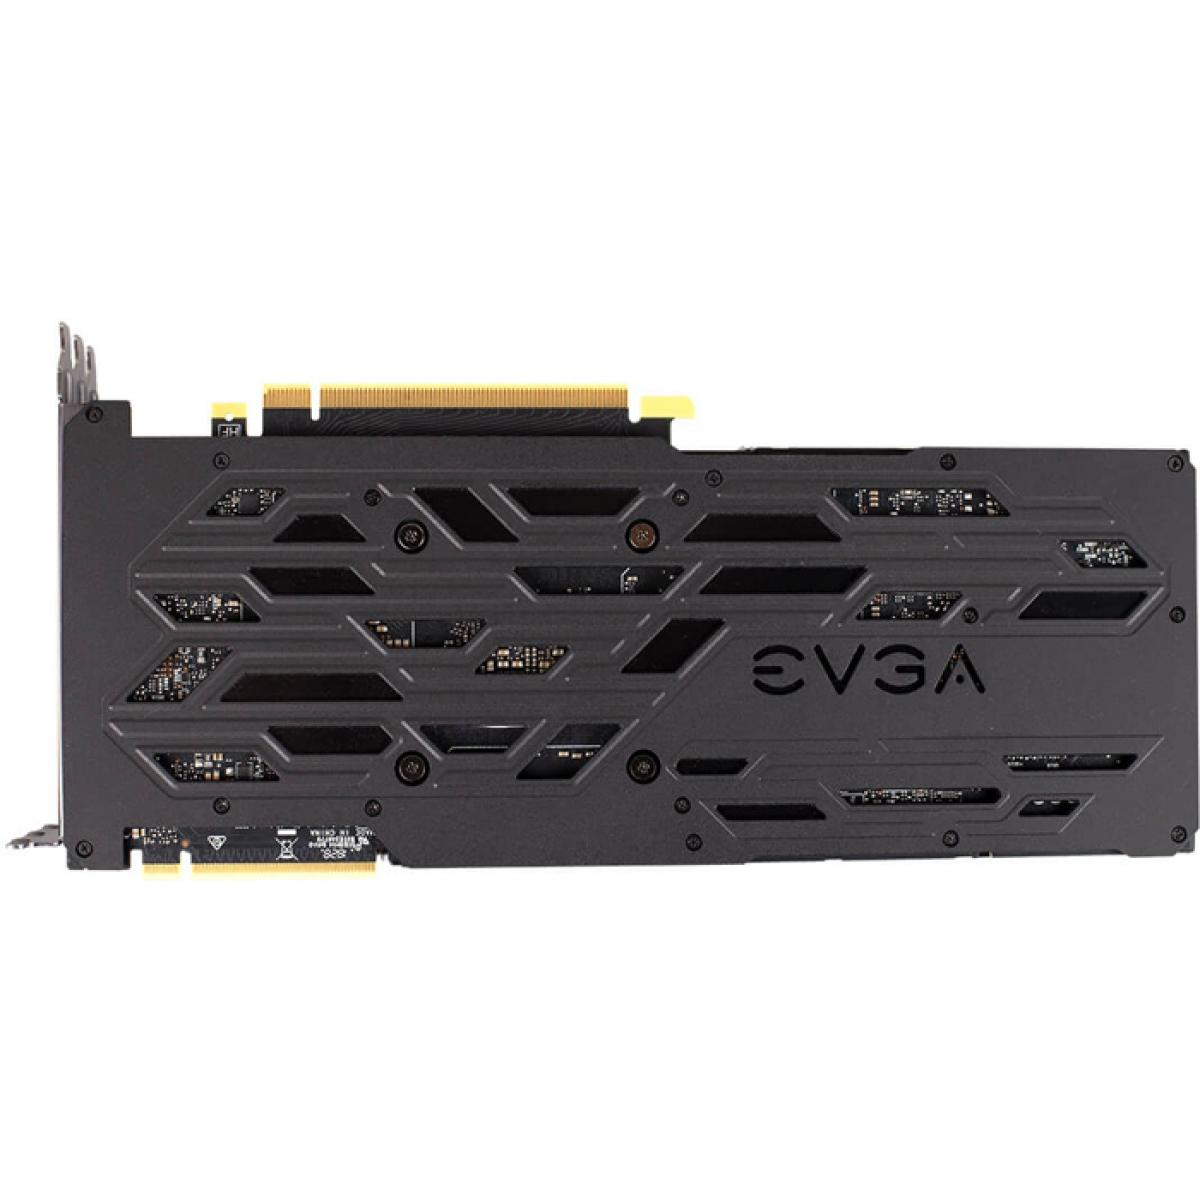 Placa de Vídeo EVGA Geforce RTX 2080 Ti XC Ultra Gaming Dual, 11GB GDDR6, 352Bit, 11G-P4-2383-KR